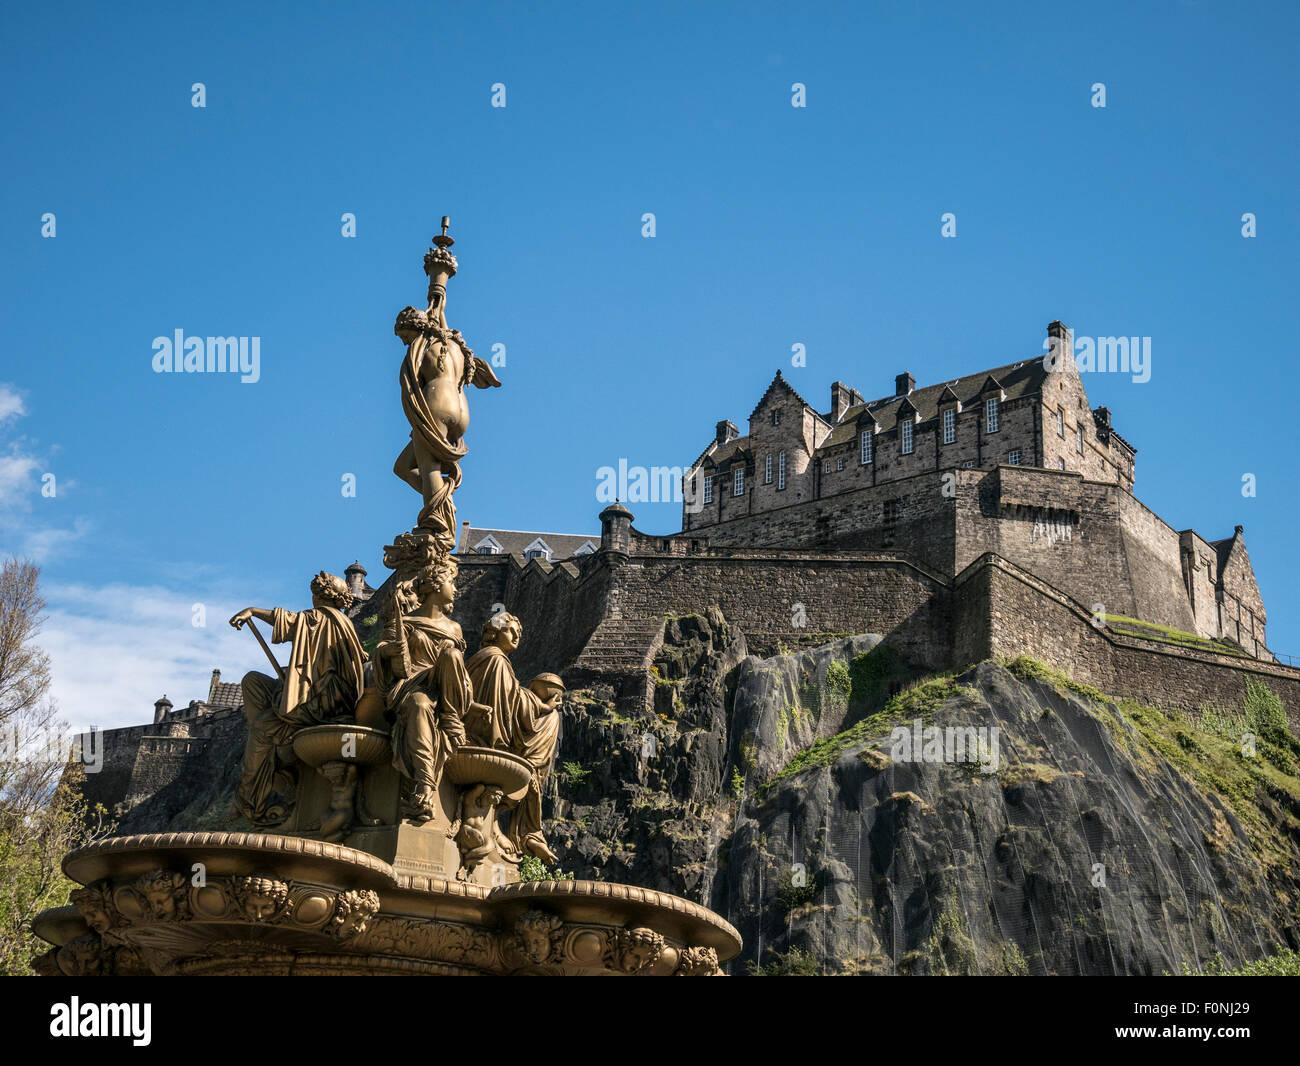 Edinburgh Castle and Fountain Scotland UK - Stock Image